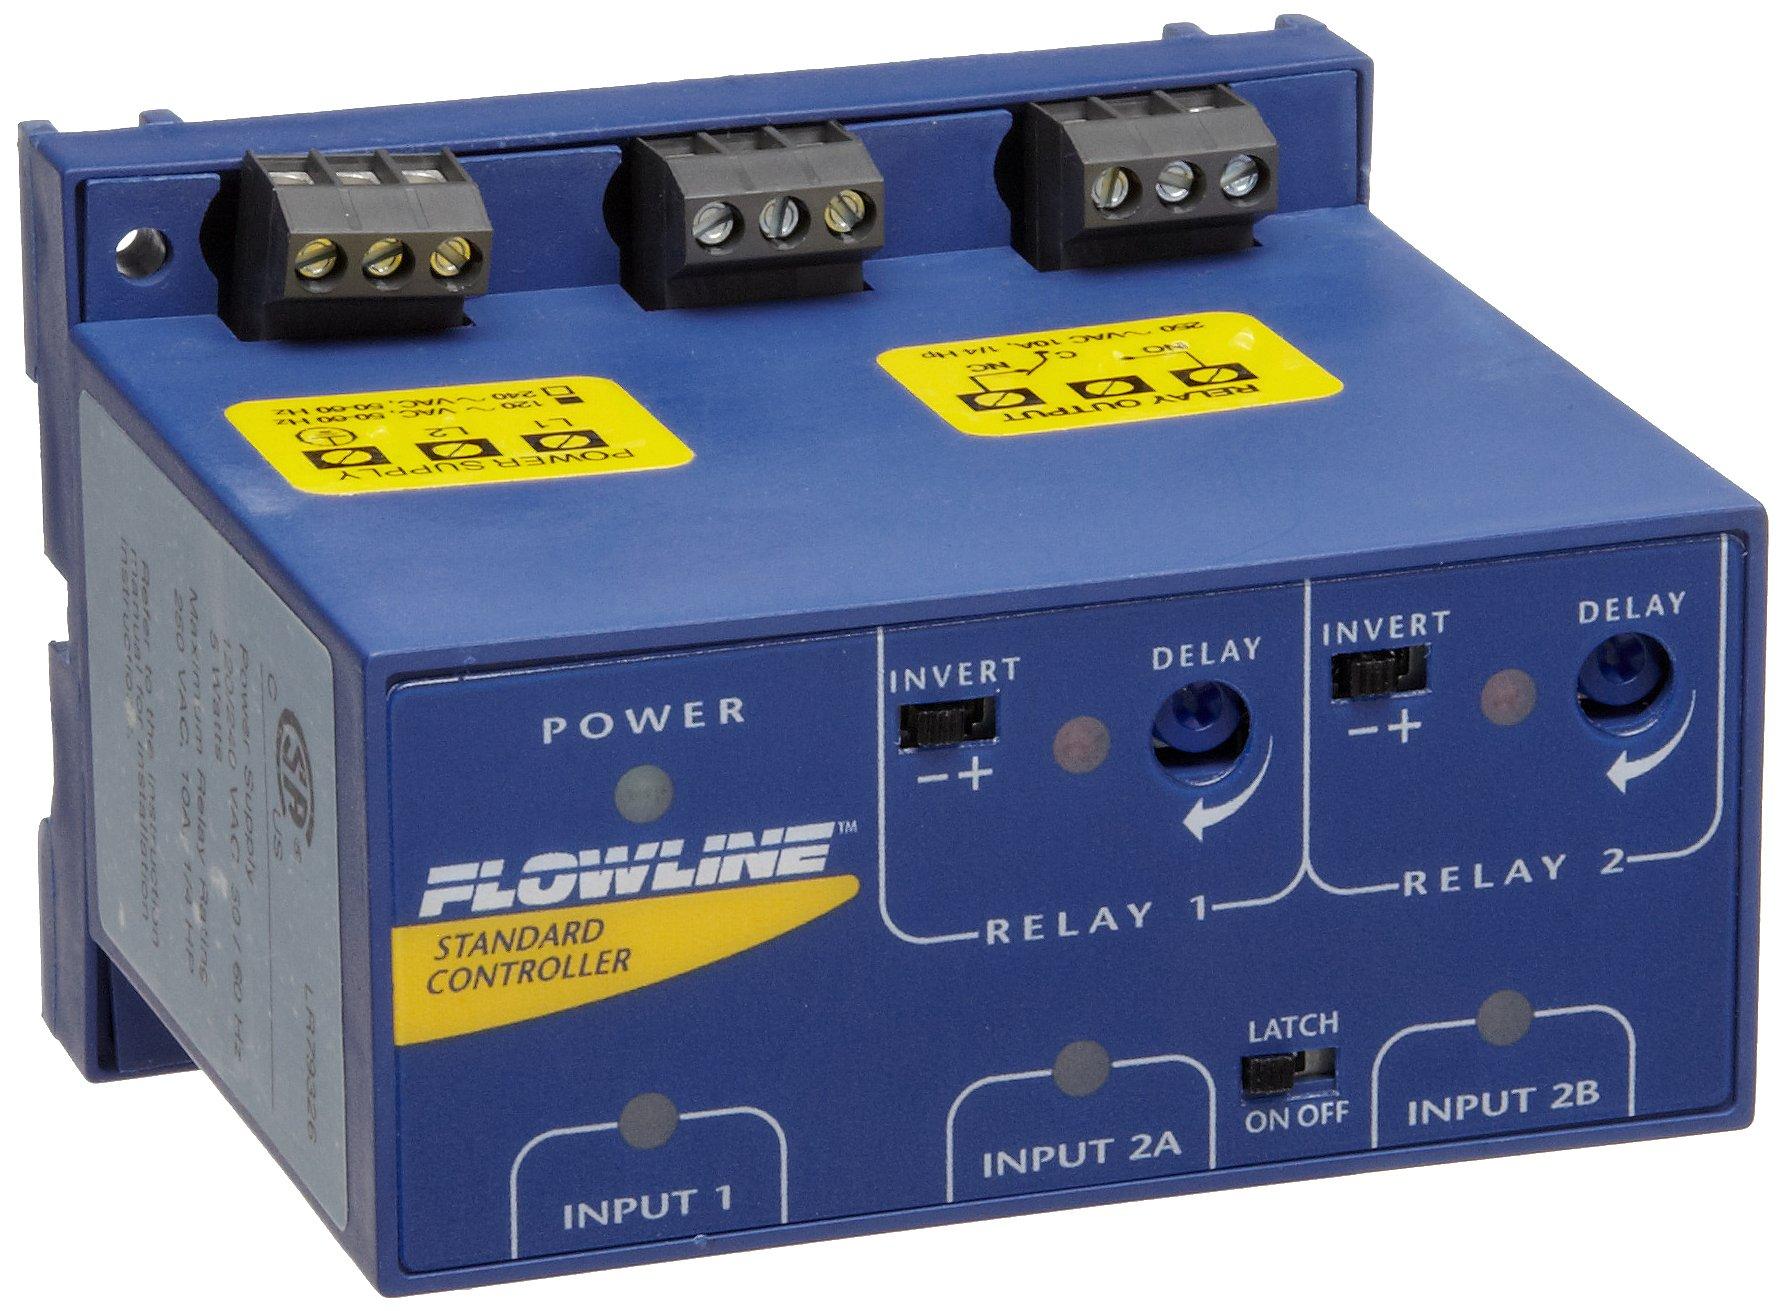 Flowline LC42-1001 Switch-Pro Remote Level Gen-Purpose Controller, 2 Relays/1 Latching, 3 Sensors, 19.05mm NPT